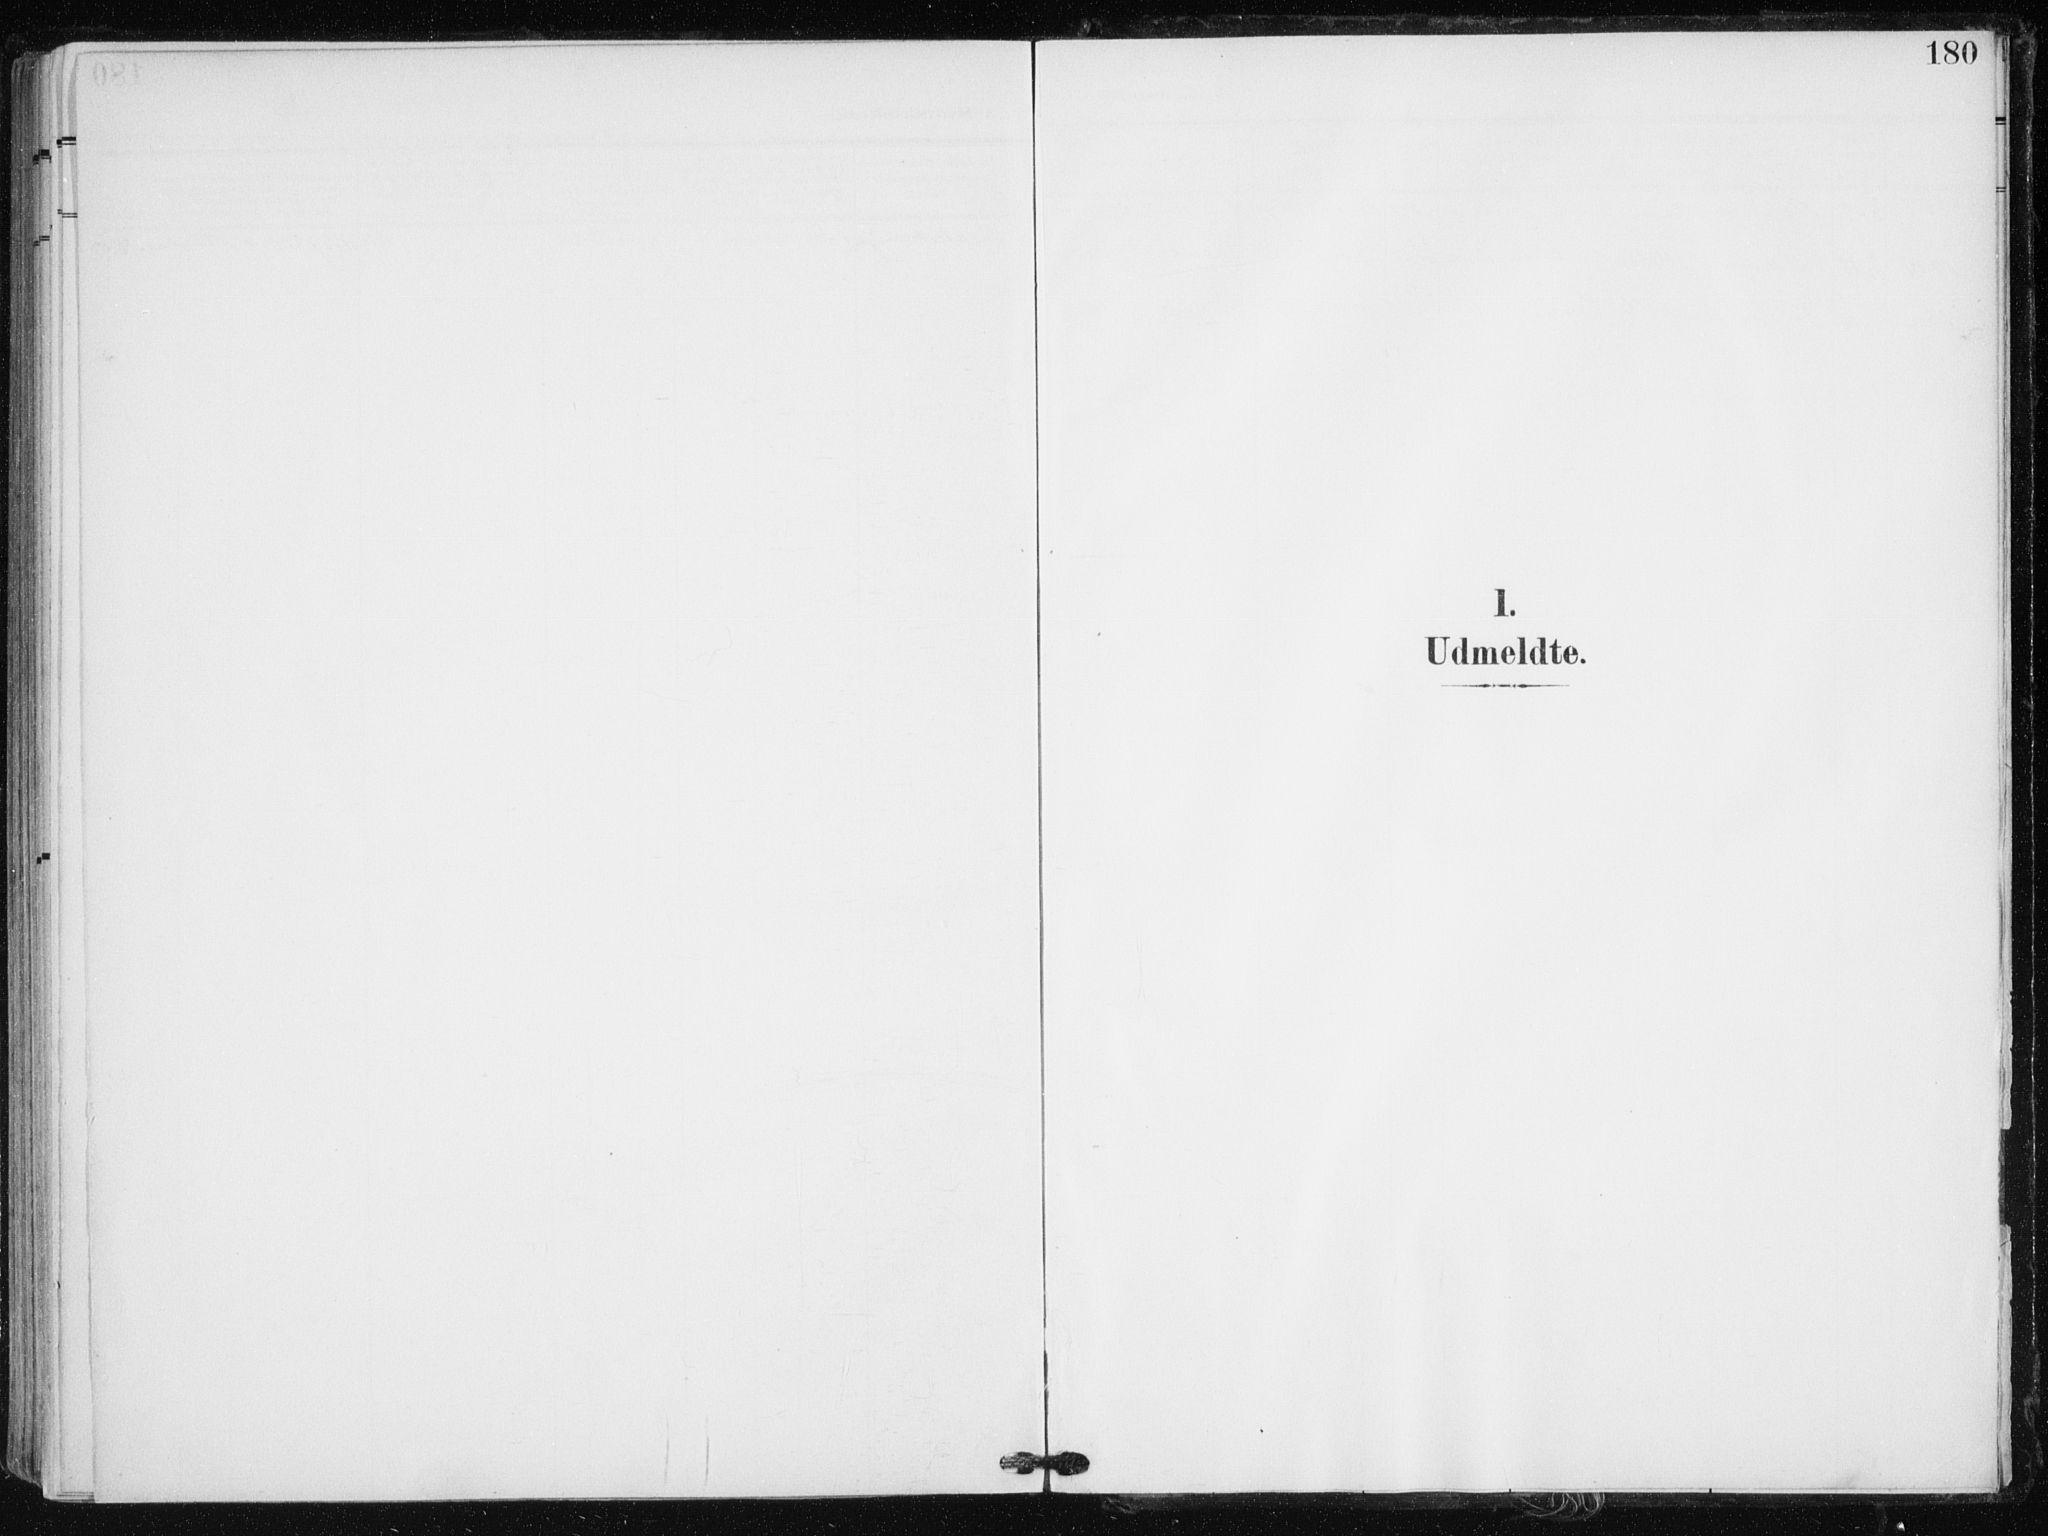 SATØ, Tranøy sokneprestkontor, I/Ia/Iaa/L0012kirke: Ministerialbok nr. 12, 1905-1918, s. 180